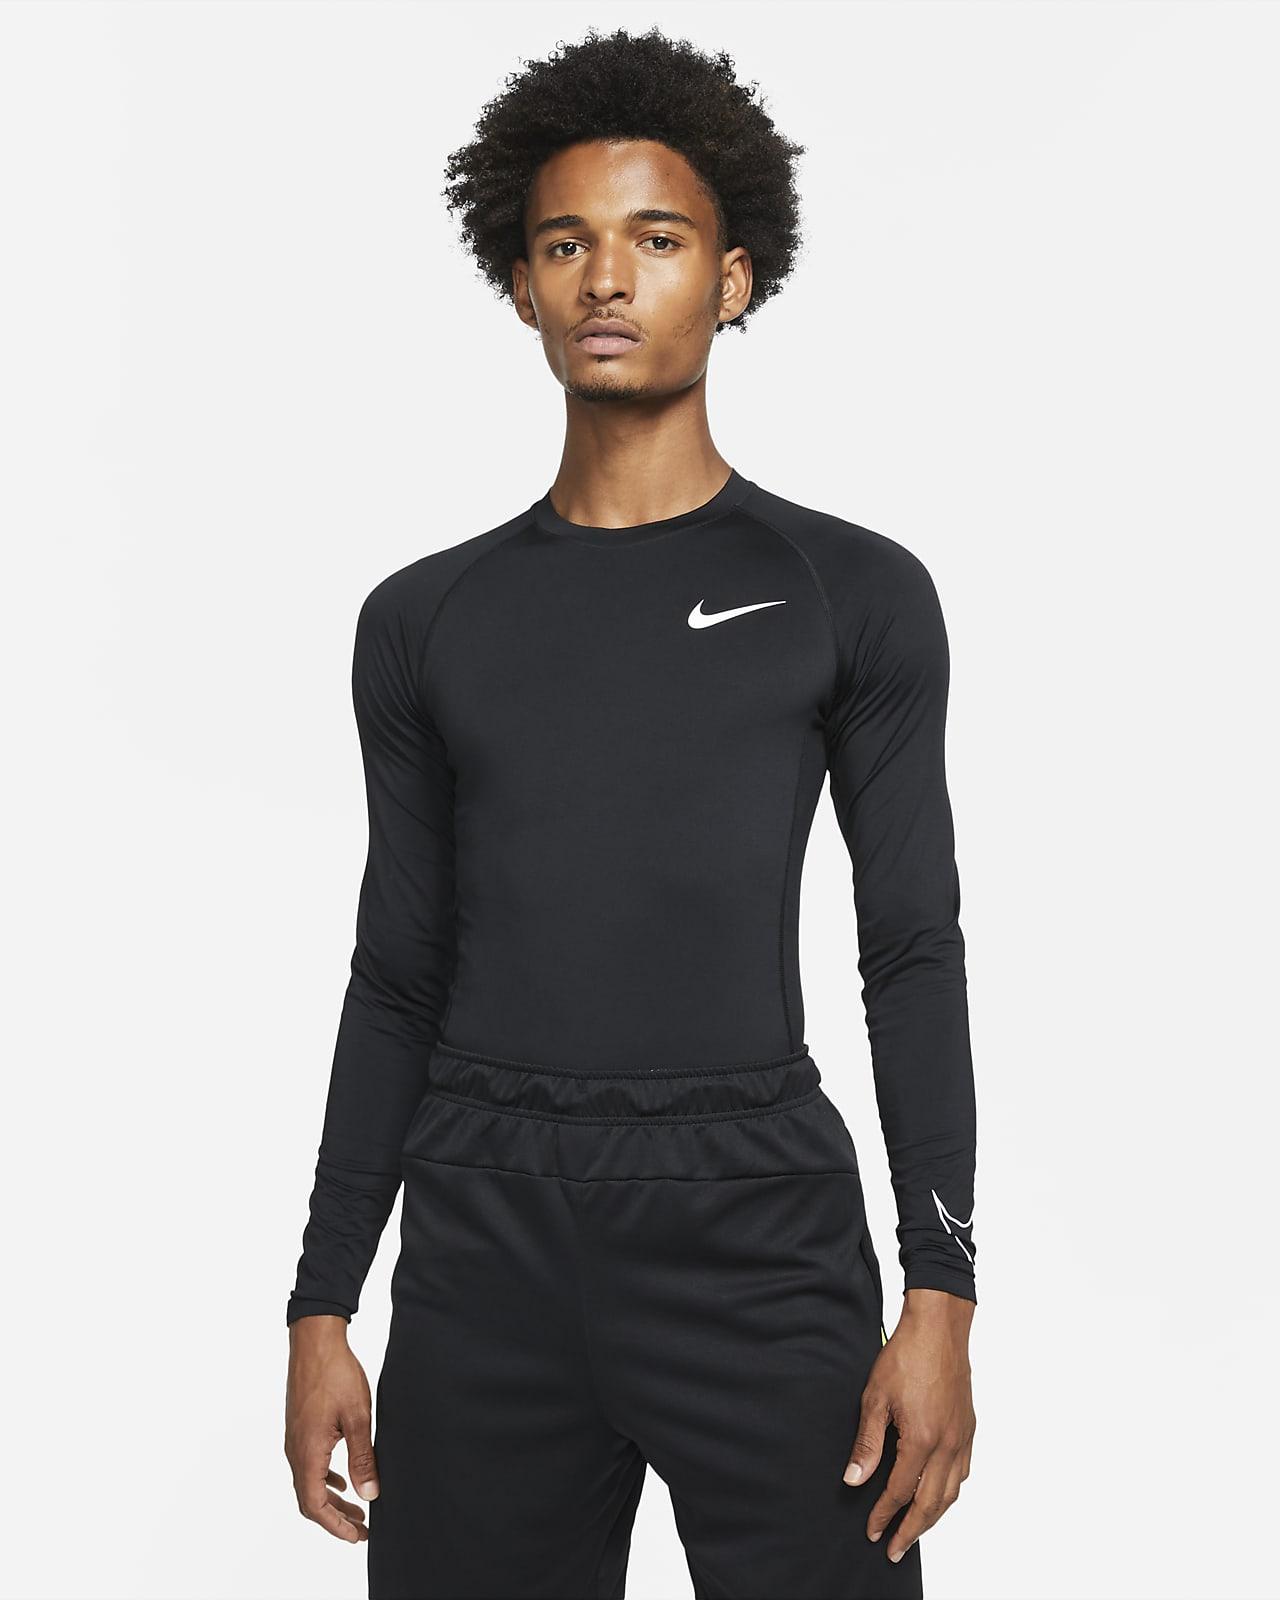 Prenda para la parte superior de manga larga con ajuste ceñido para hombre Nike Pro Dri-FIT